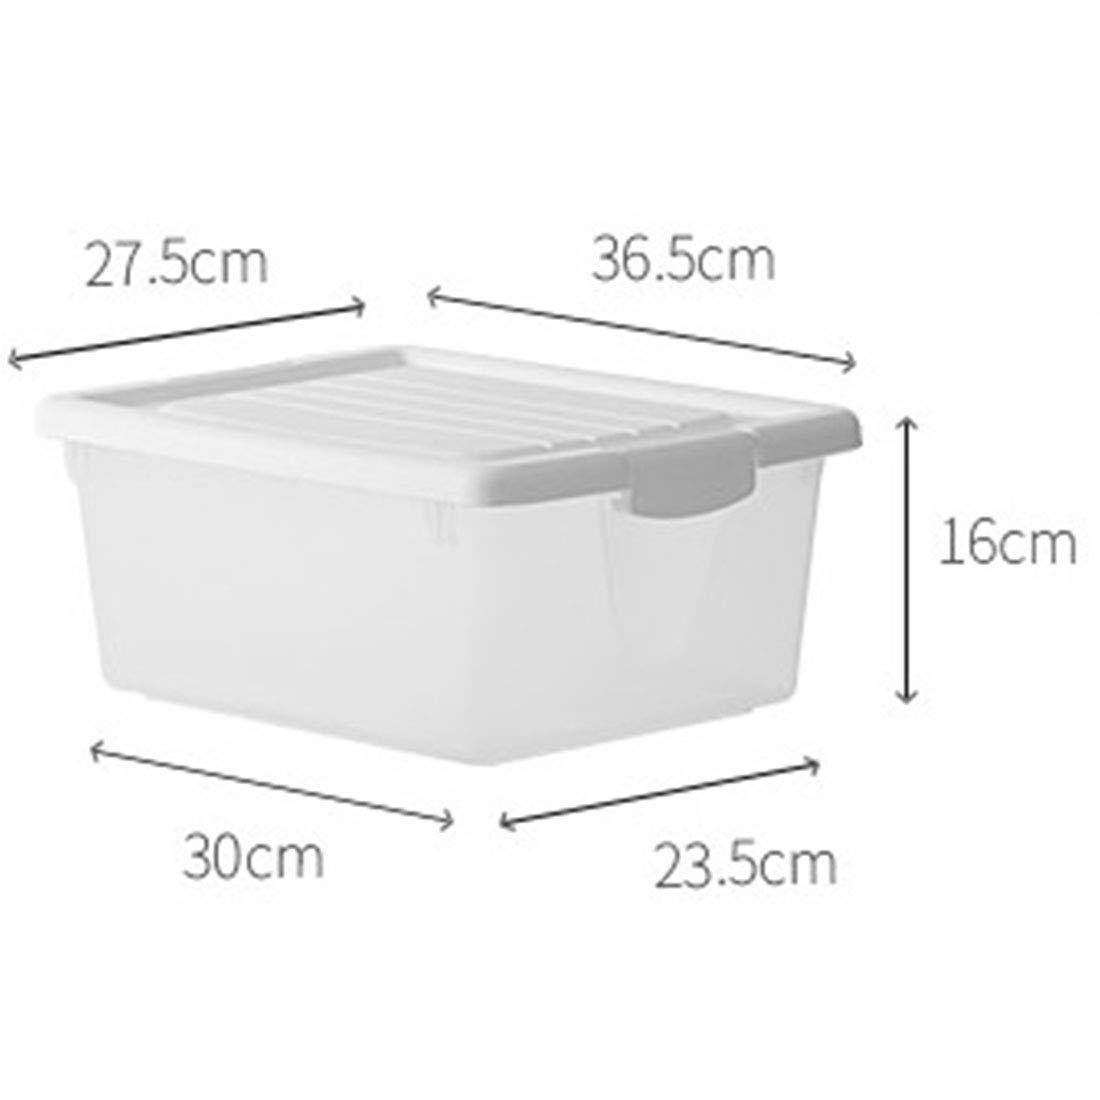 MHKBD-JPプラスチック収納ボックス透明服収納ボックスポータブル雑貨収納ボックス大屋根 収納ケース (色 : Light Small) B07T1WBTZH Light Small